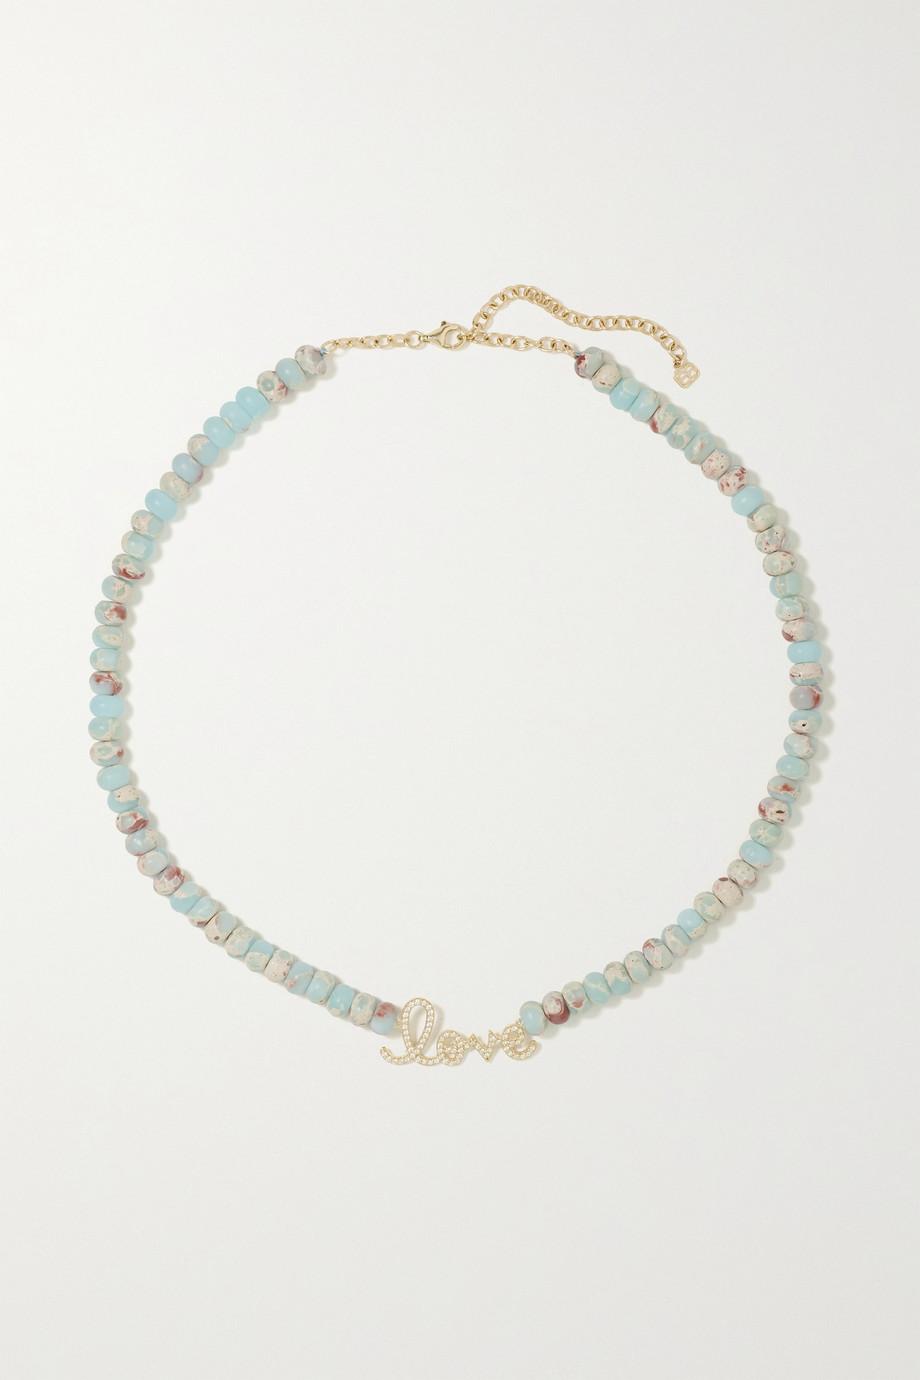 Sydney Evan Large Love 14-karat gold, jasper and diamond necklace